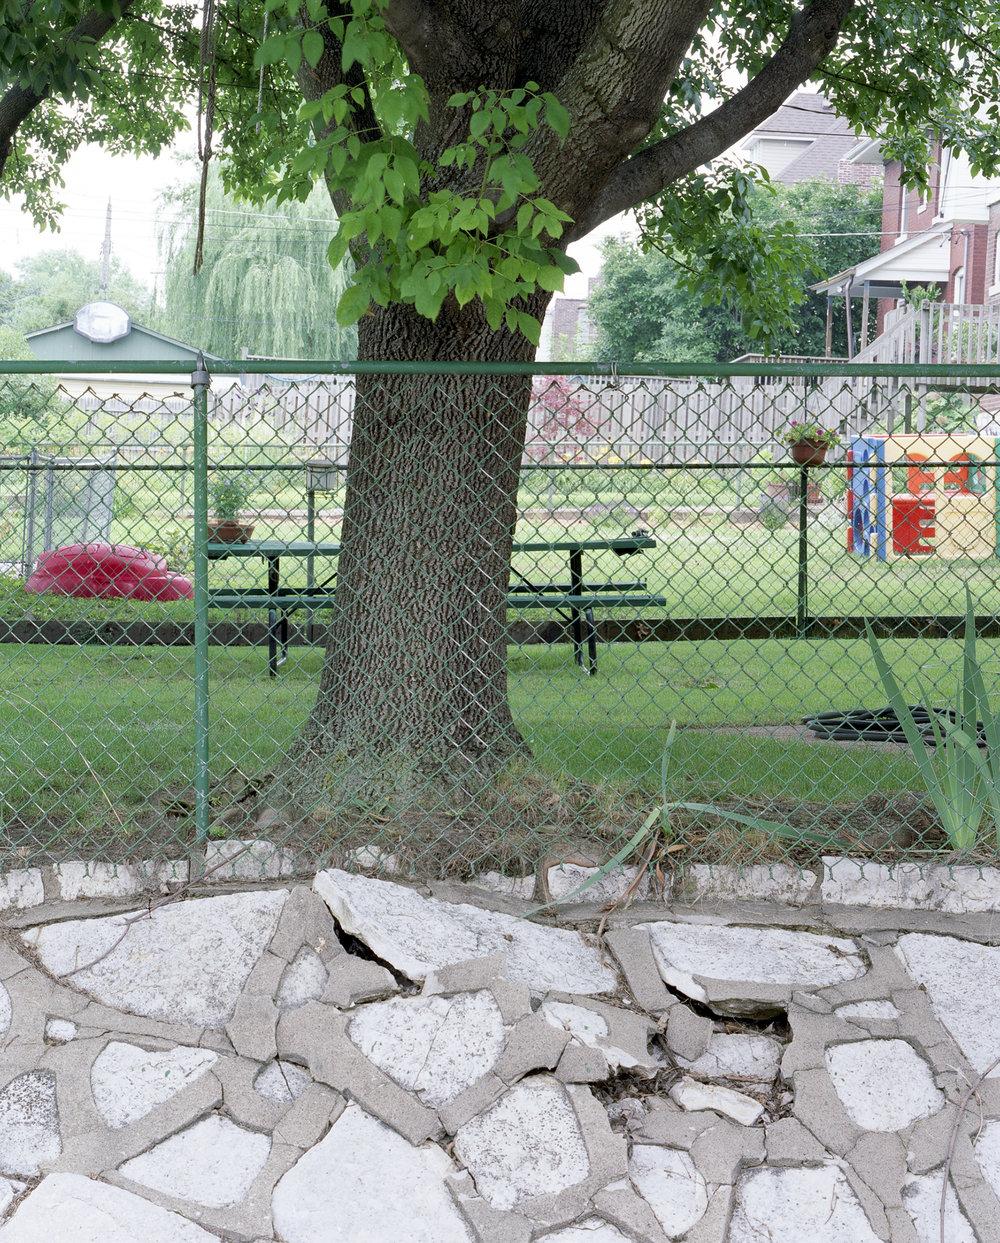 Tree, 2009